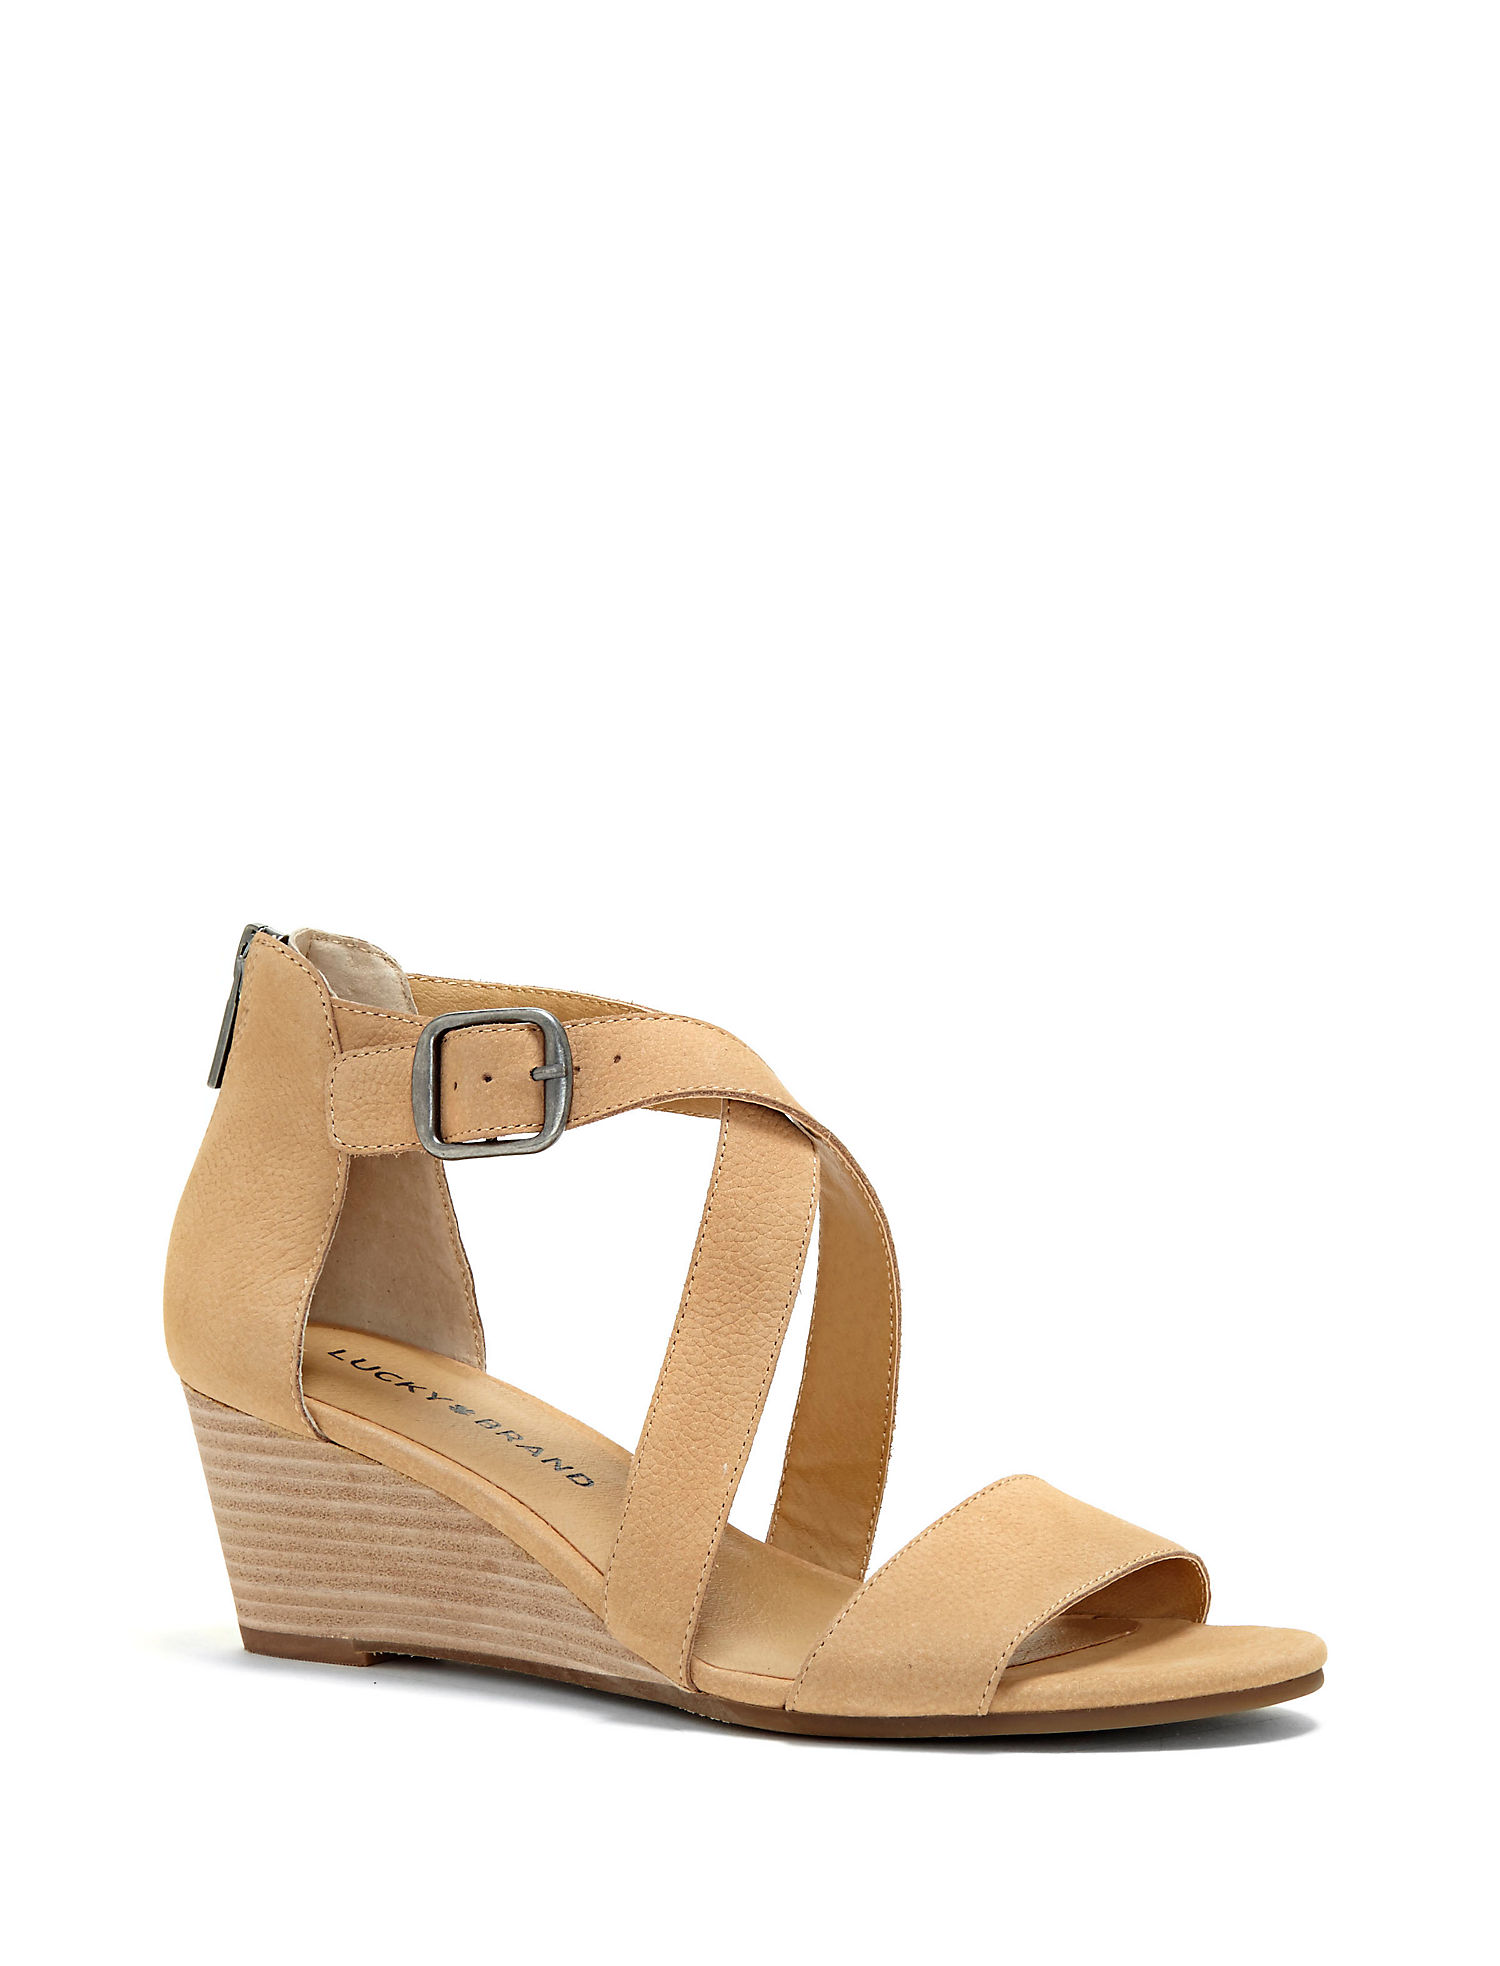 Lucky Brand Jenley Wedge Sandal (Women's) Ib83r1HhI